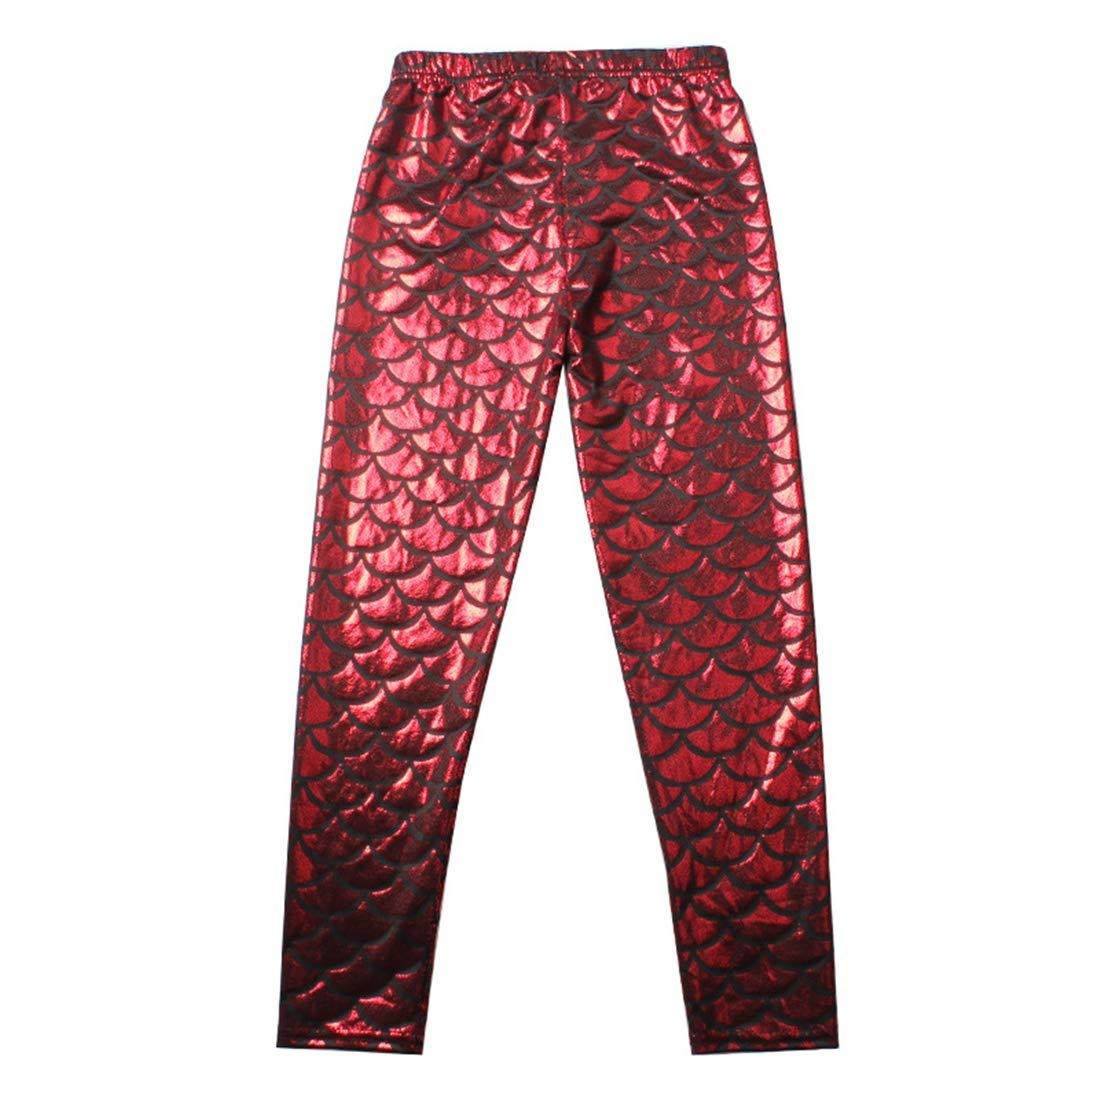 Girls Stretch Tights Spring Summer Mermaid Leggings Yoga Pencil Pants Running Workout Print Gym Trousers Sportswear